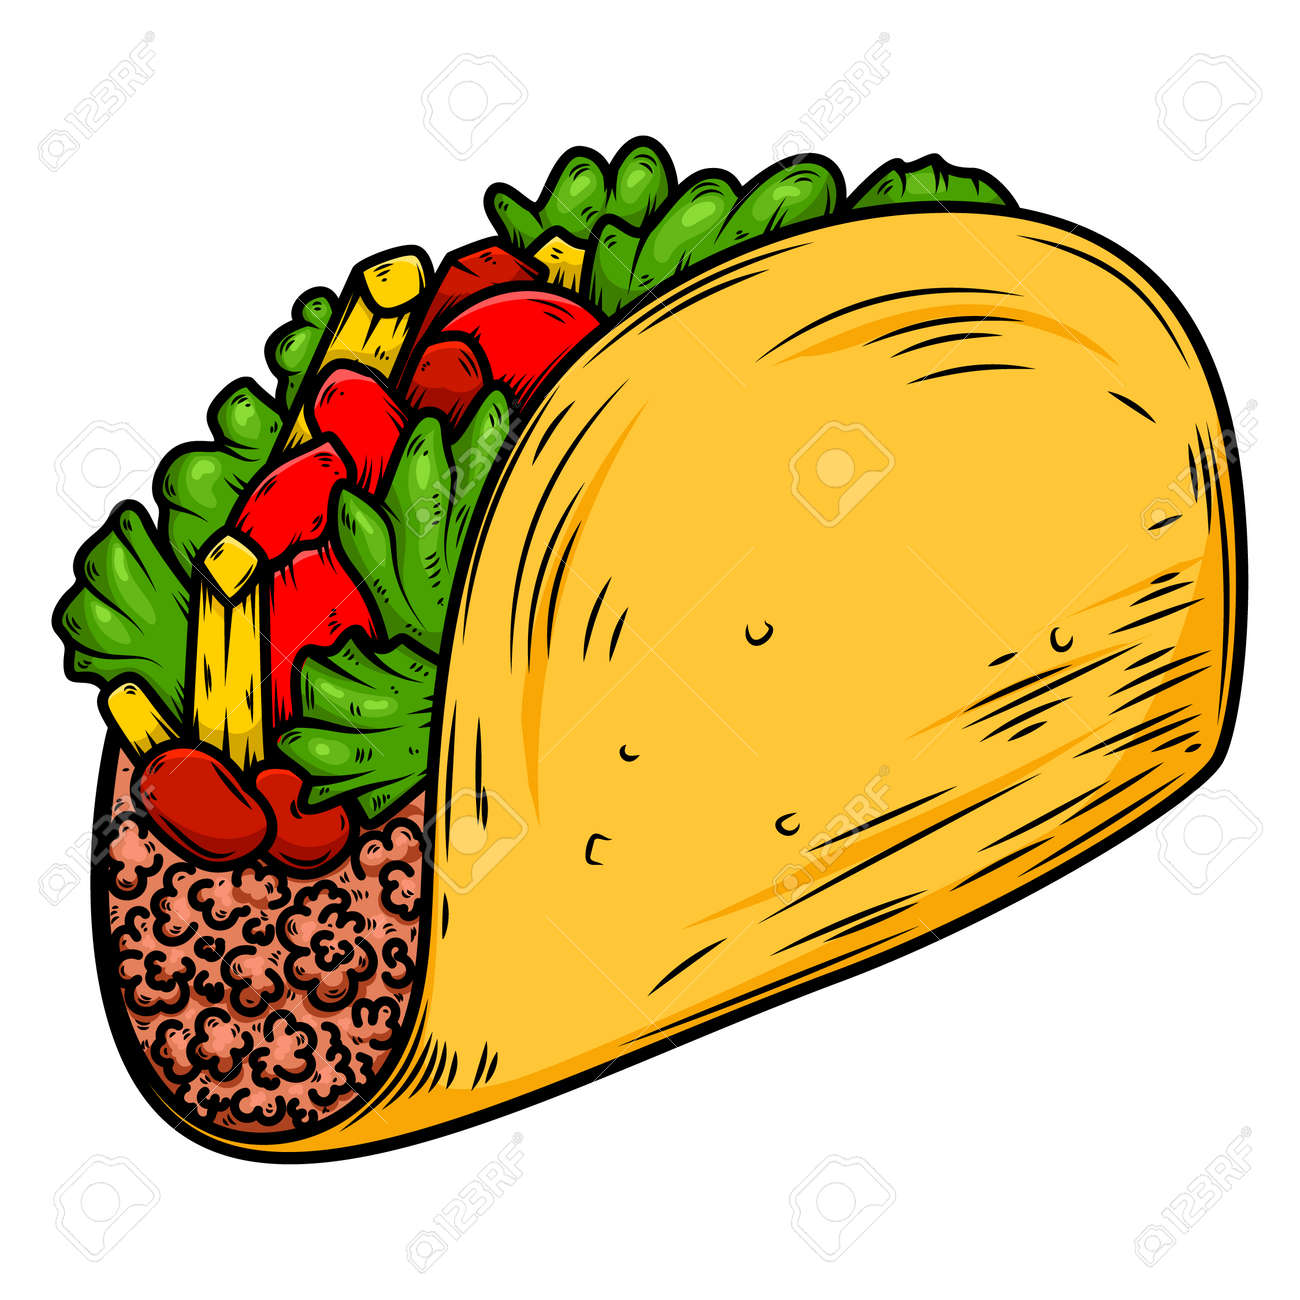 Illustration of delicious taco. Design element for poster, card, banner, sign. - 170554441